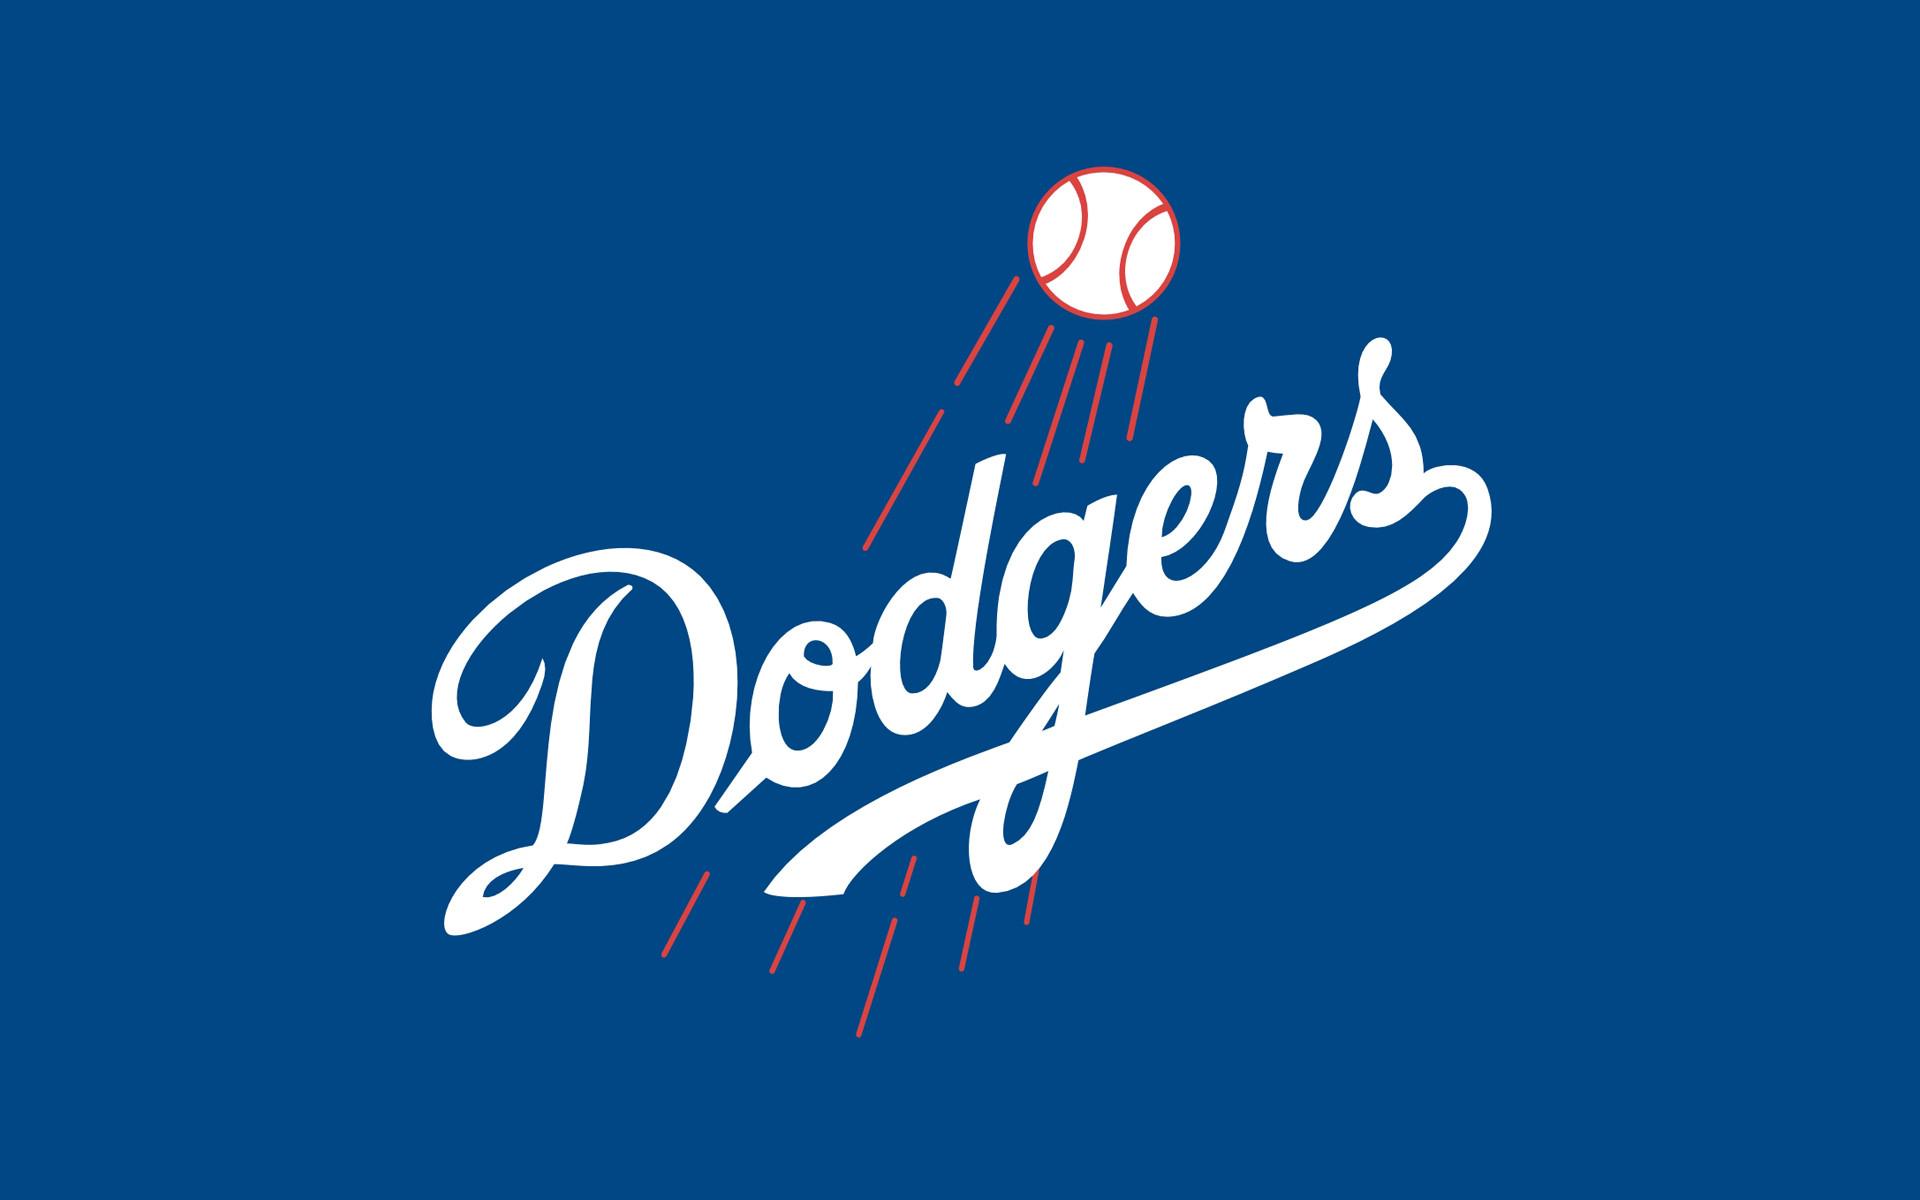 Los Angeles Dodgers Wallpaper #1